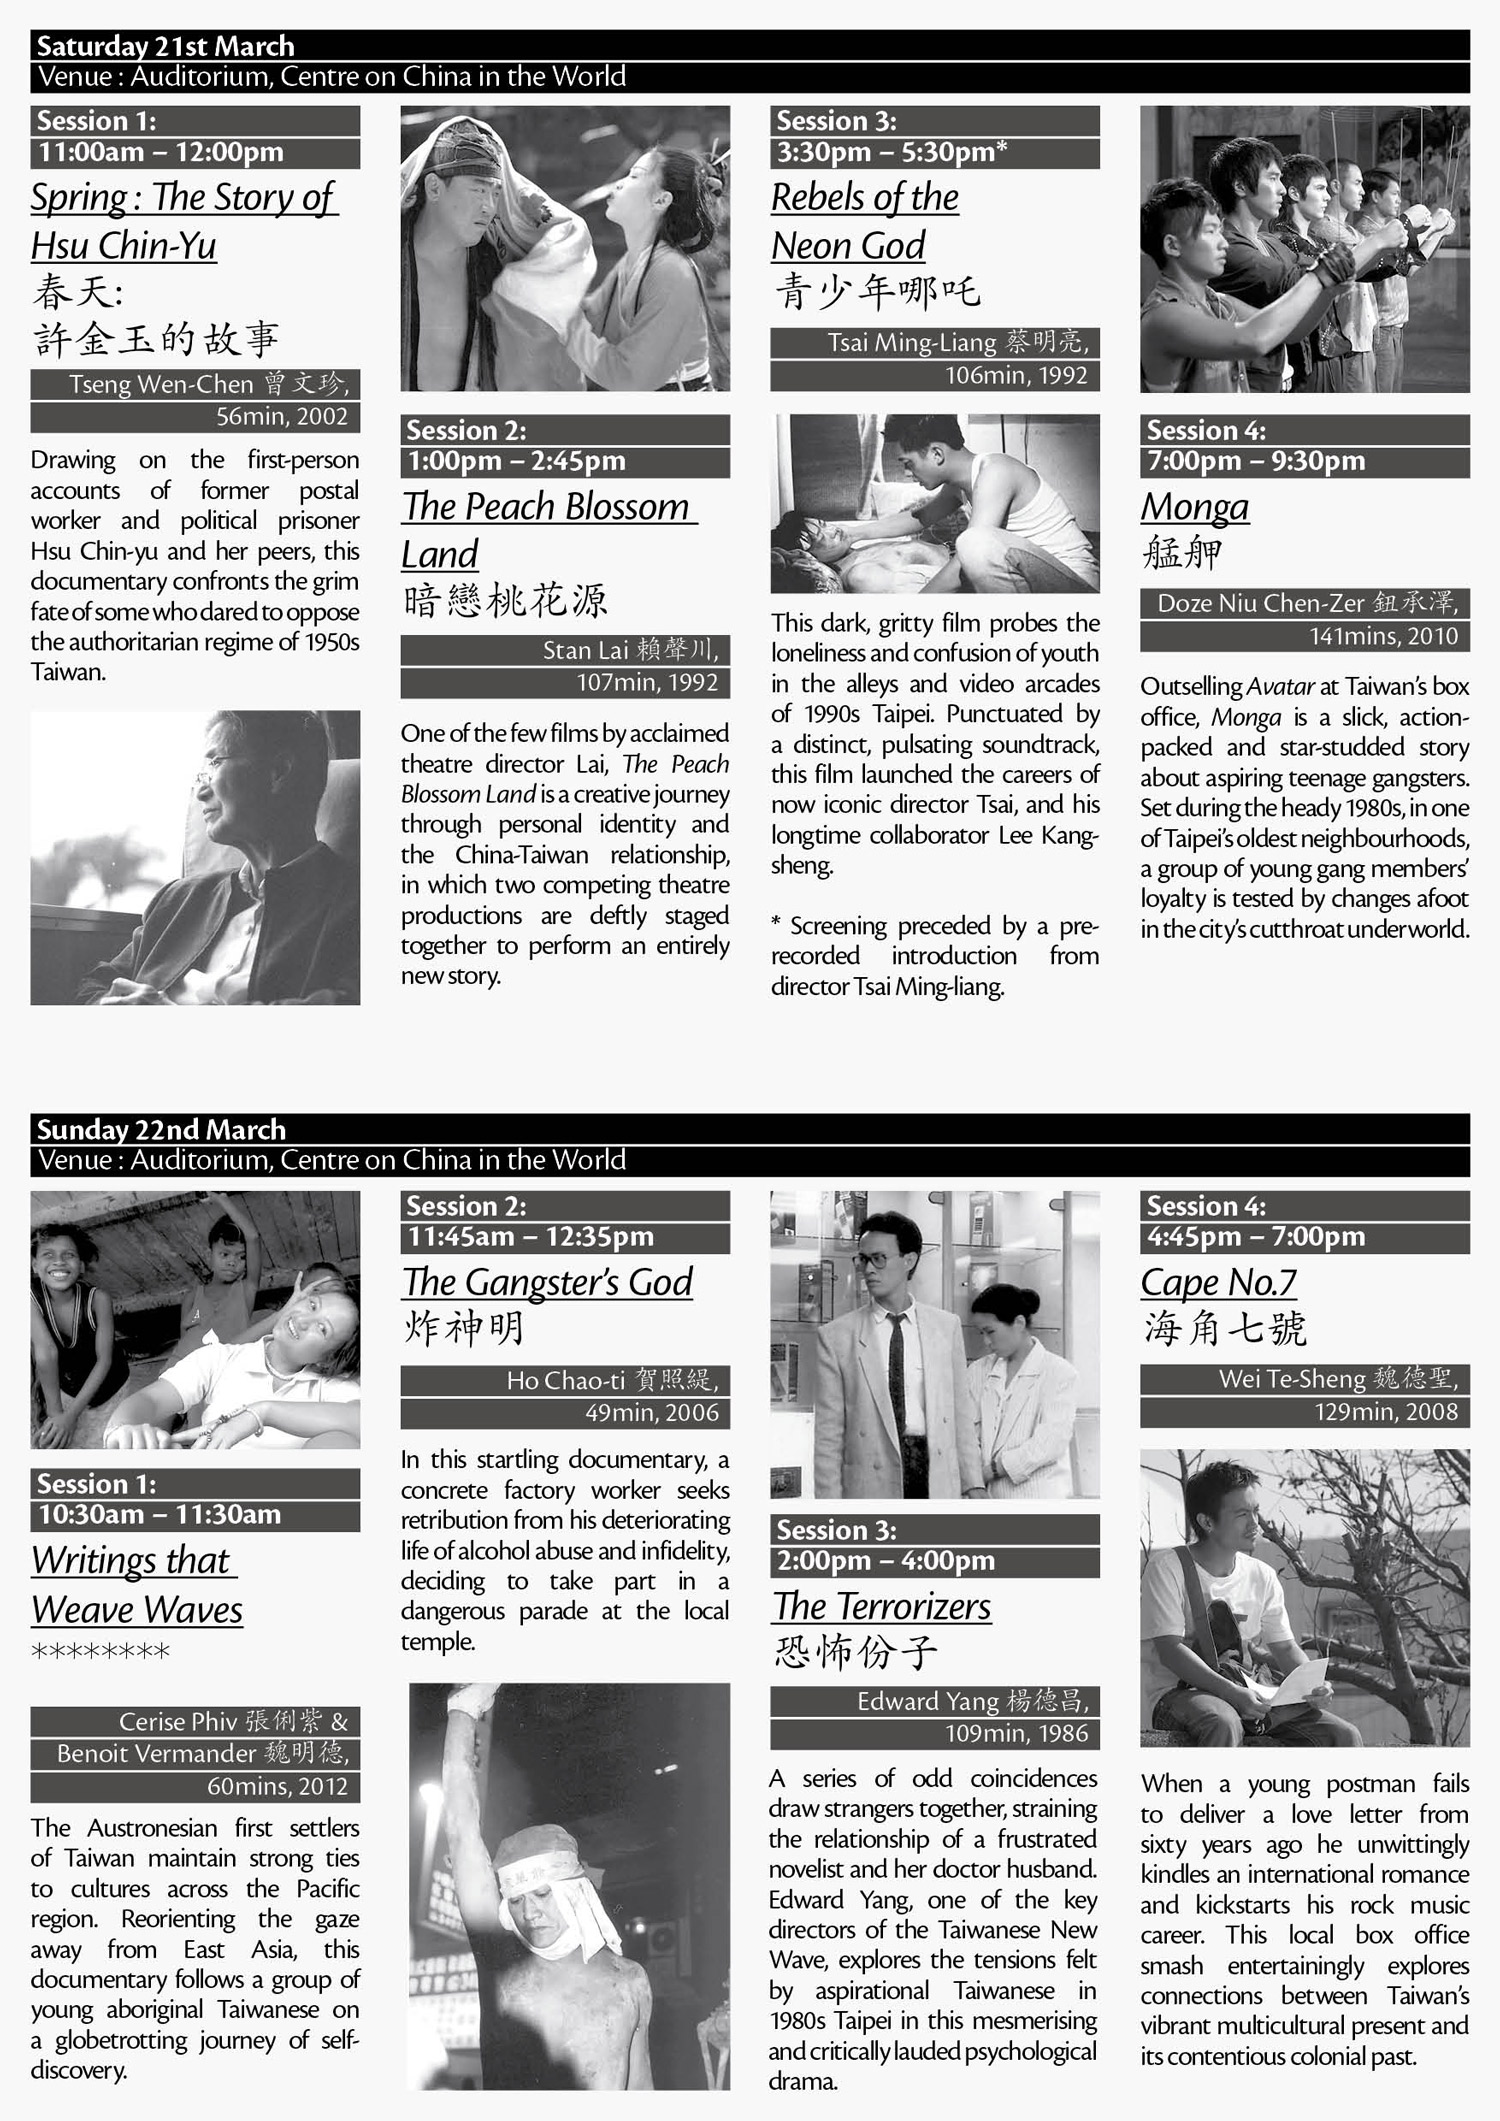 Excerpt from  Taiwan Film Festival  flyer, 2015